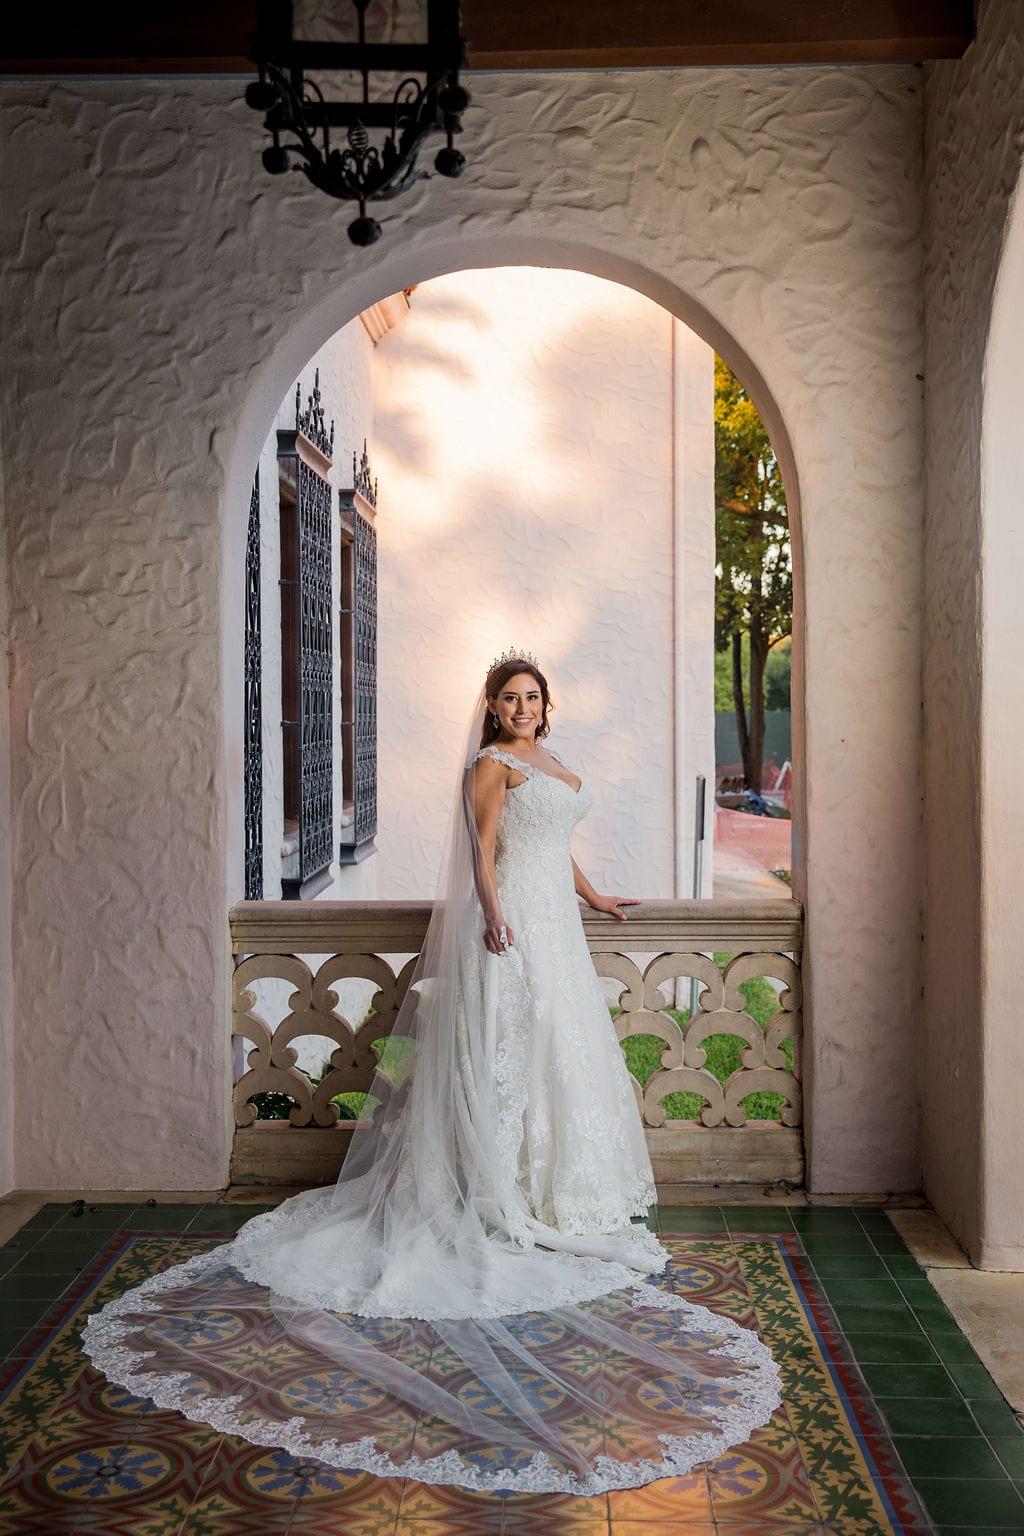 Mary Elizabeth's bridal at the McNay windowed bride